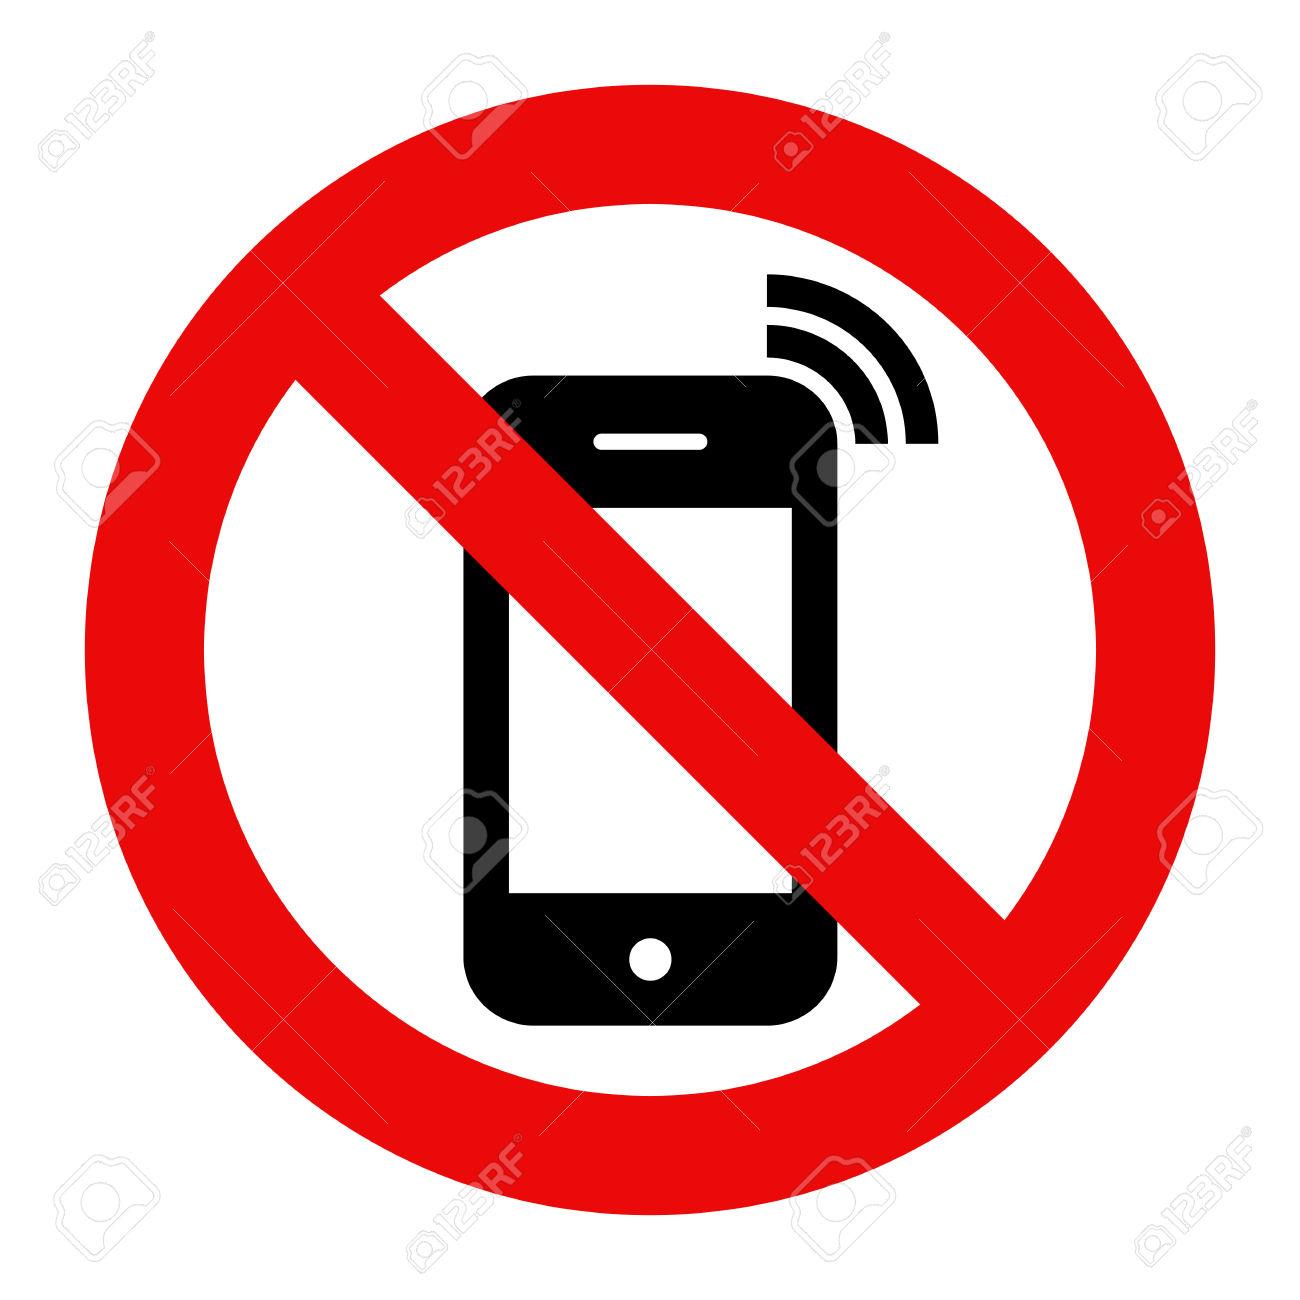 Handy Verboten. Kein Handy.